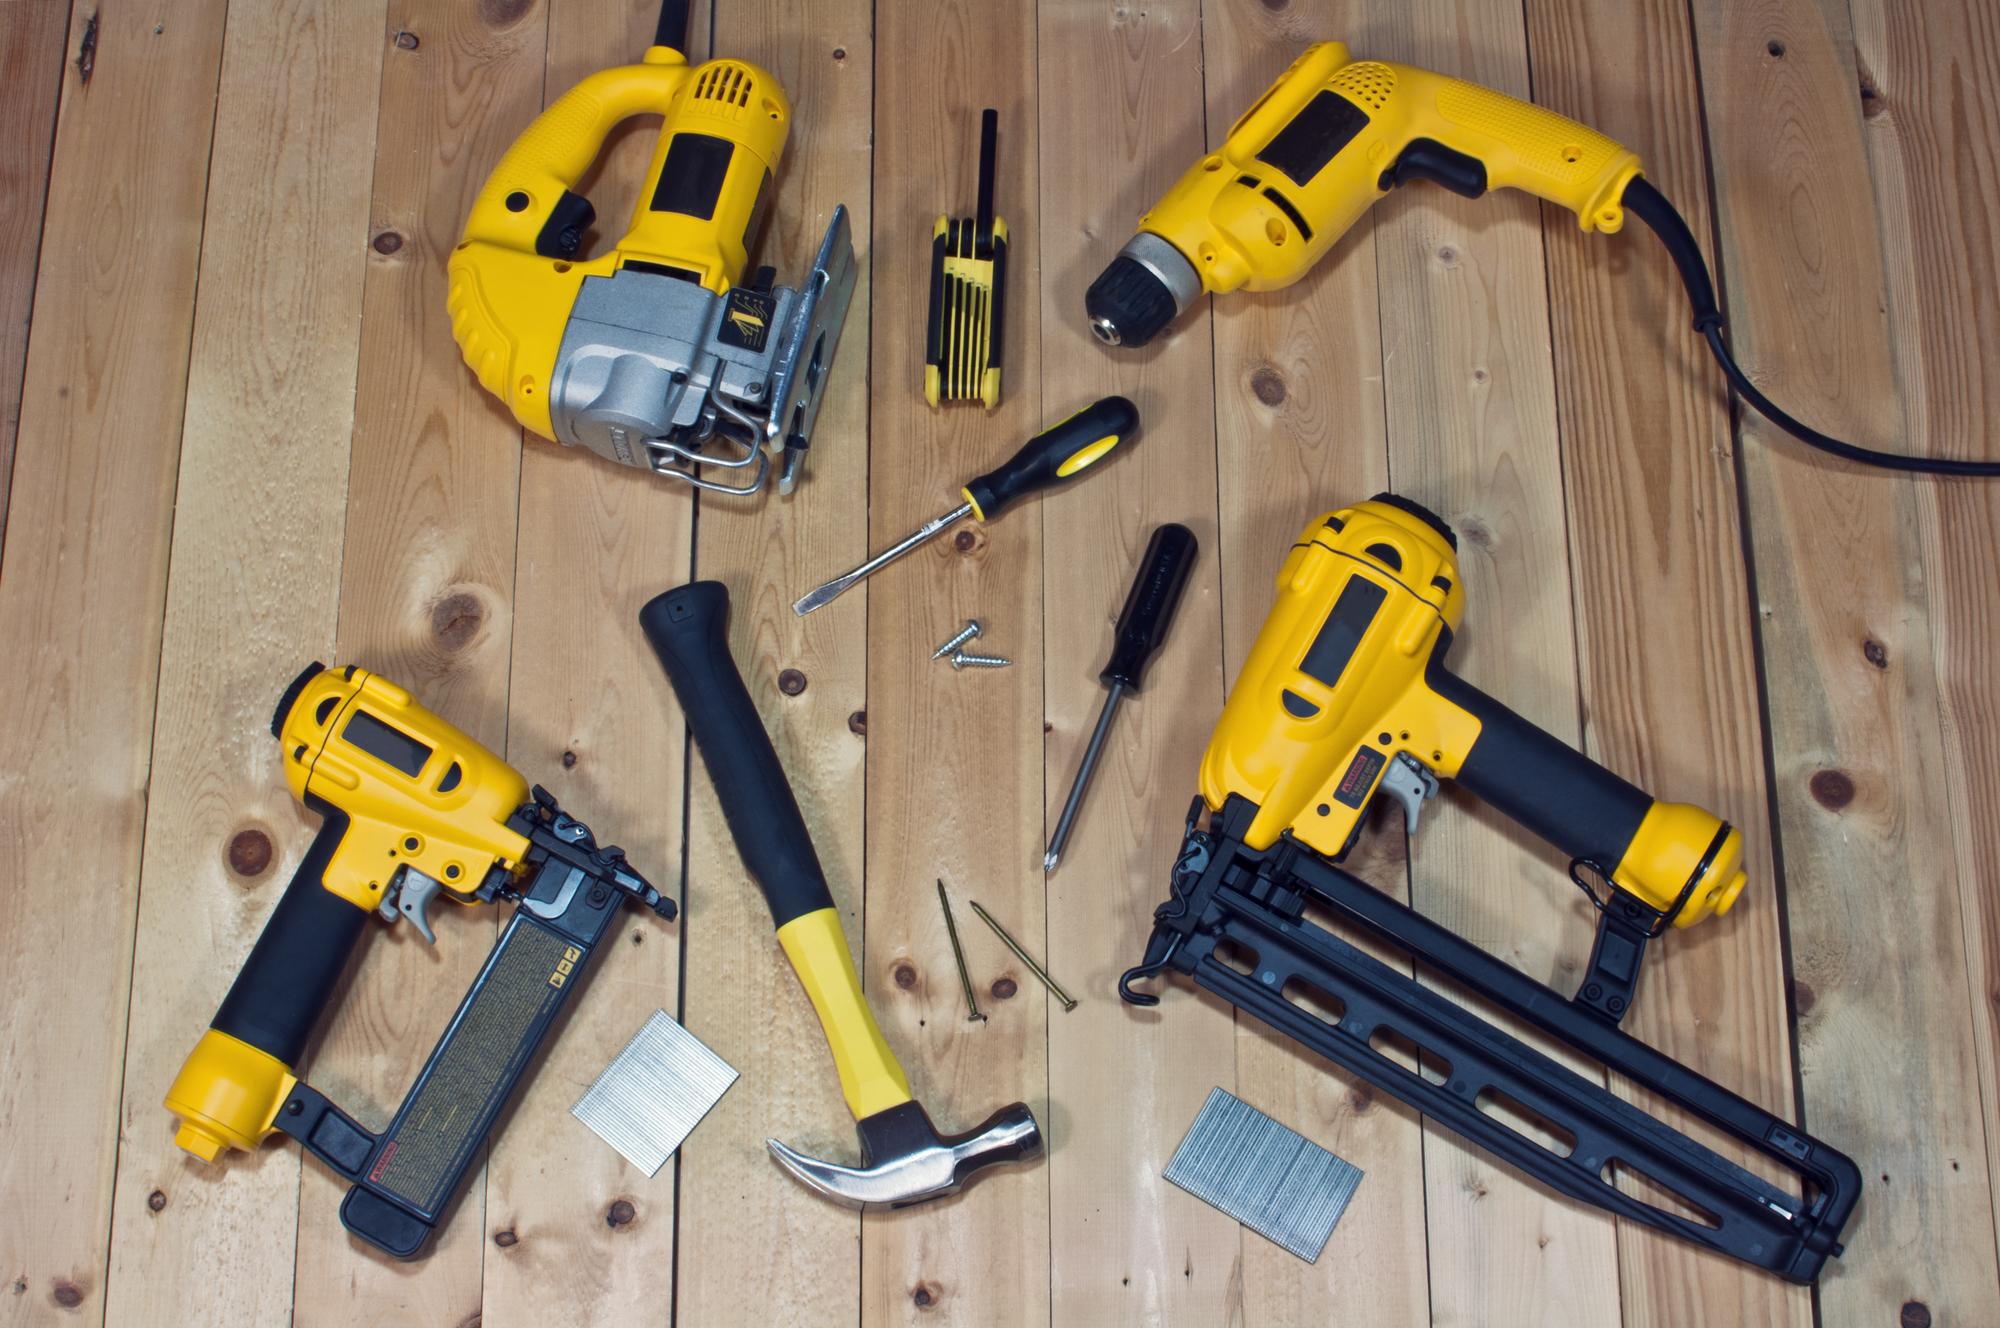 Power tools image